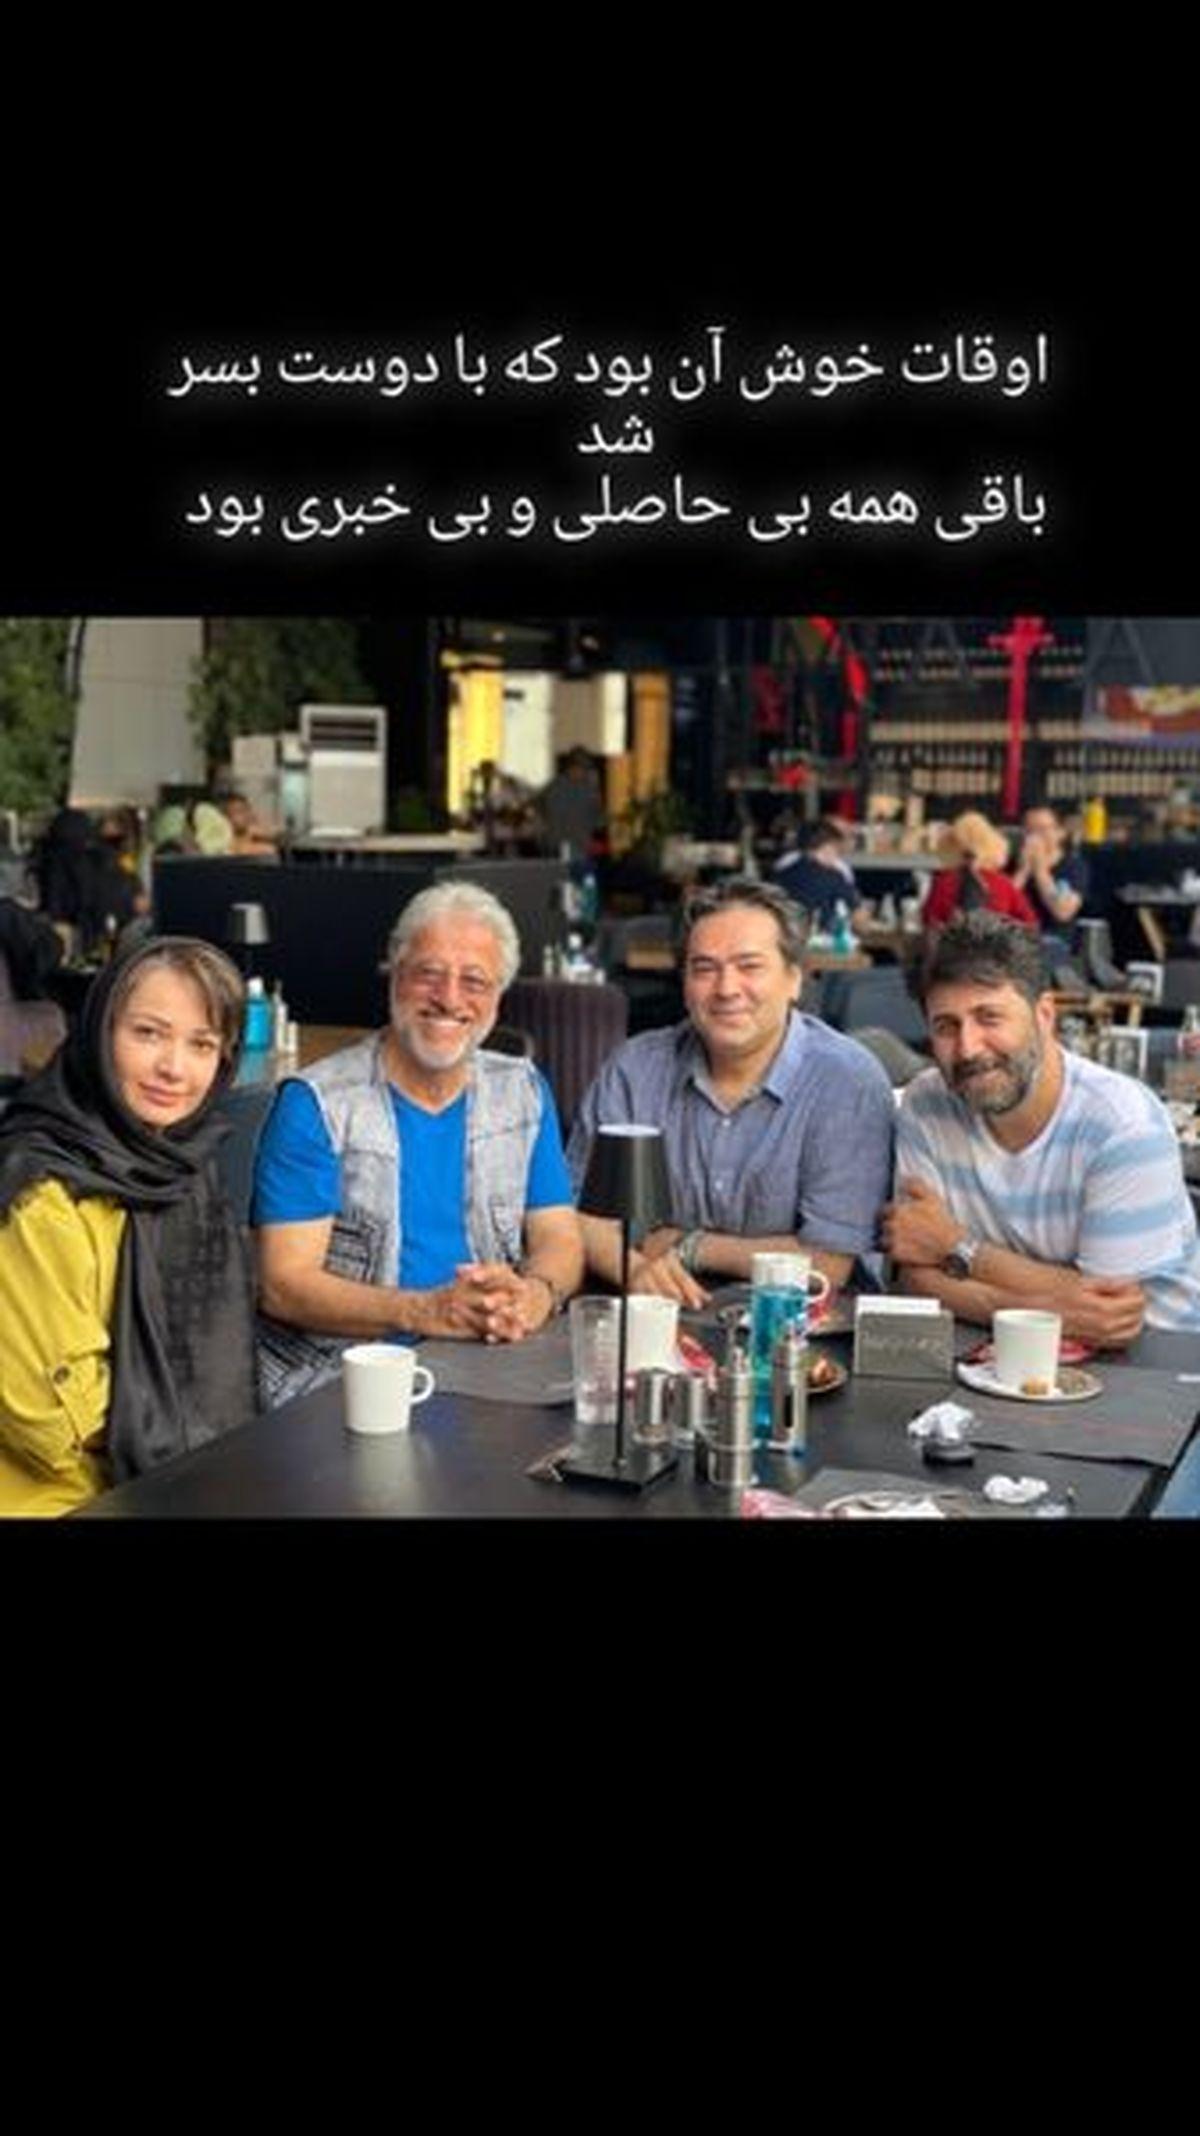 رستورانگردی فهیمه پایتخت + عکس